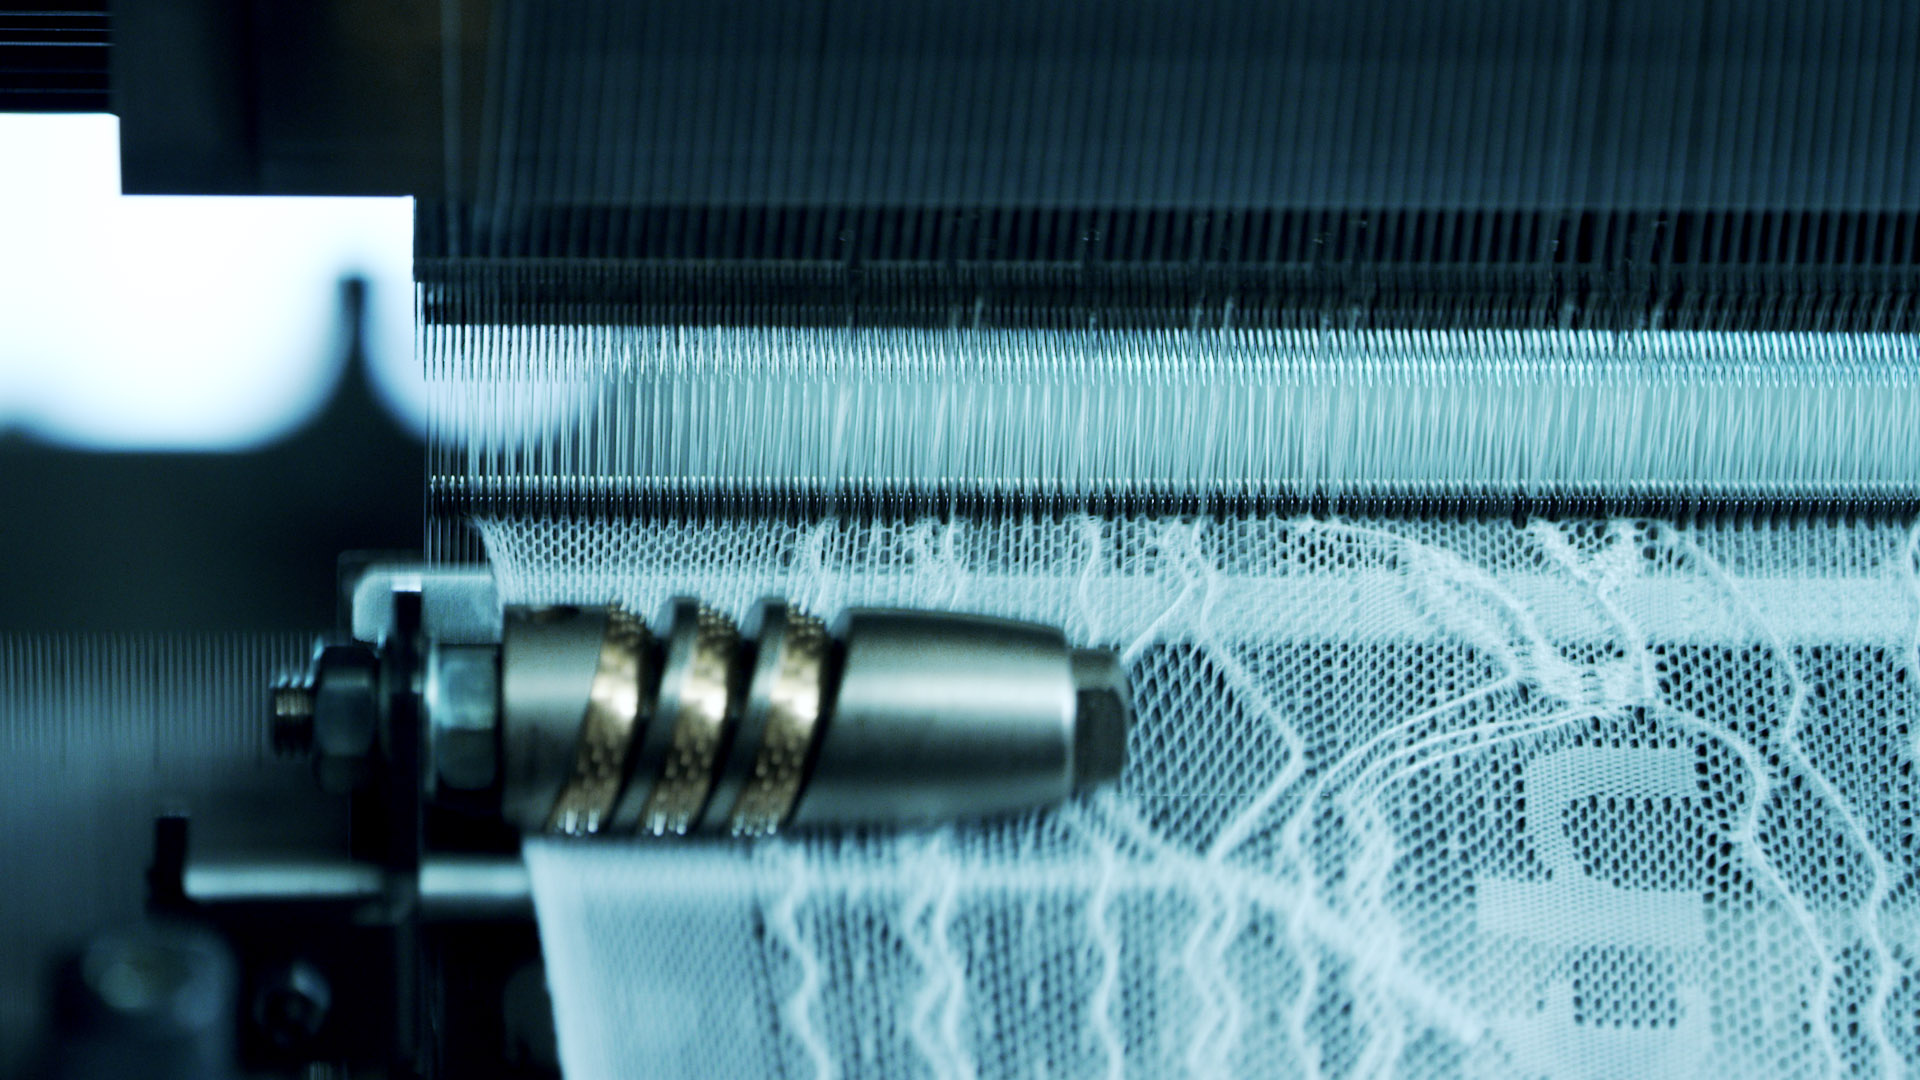 Karl-Mayer-Texture-Machine-Production-Textile_16.jpg